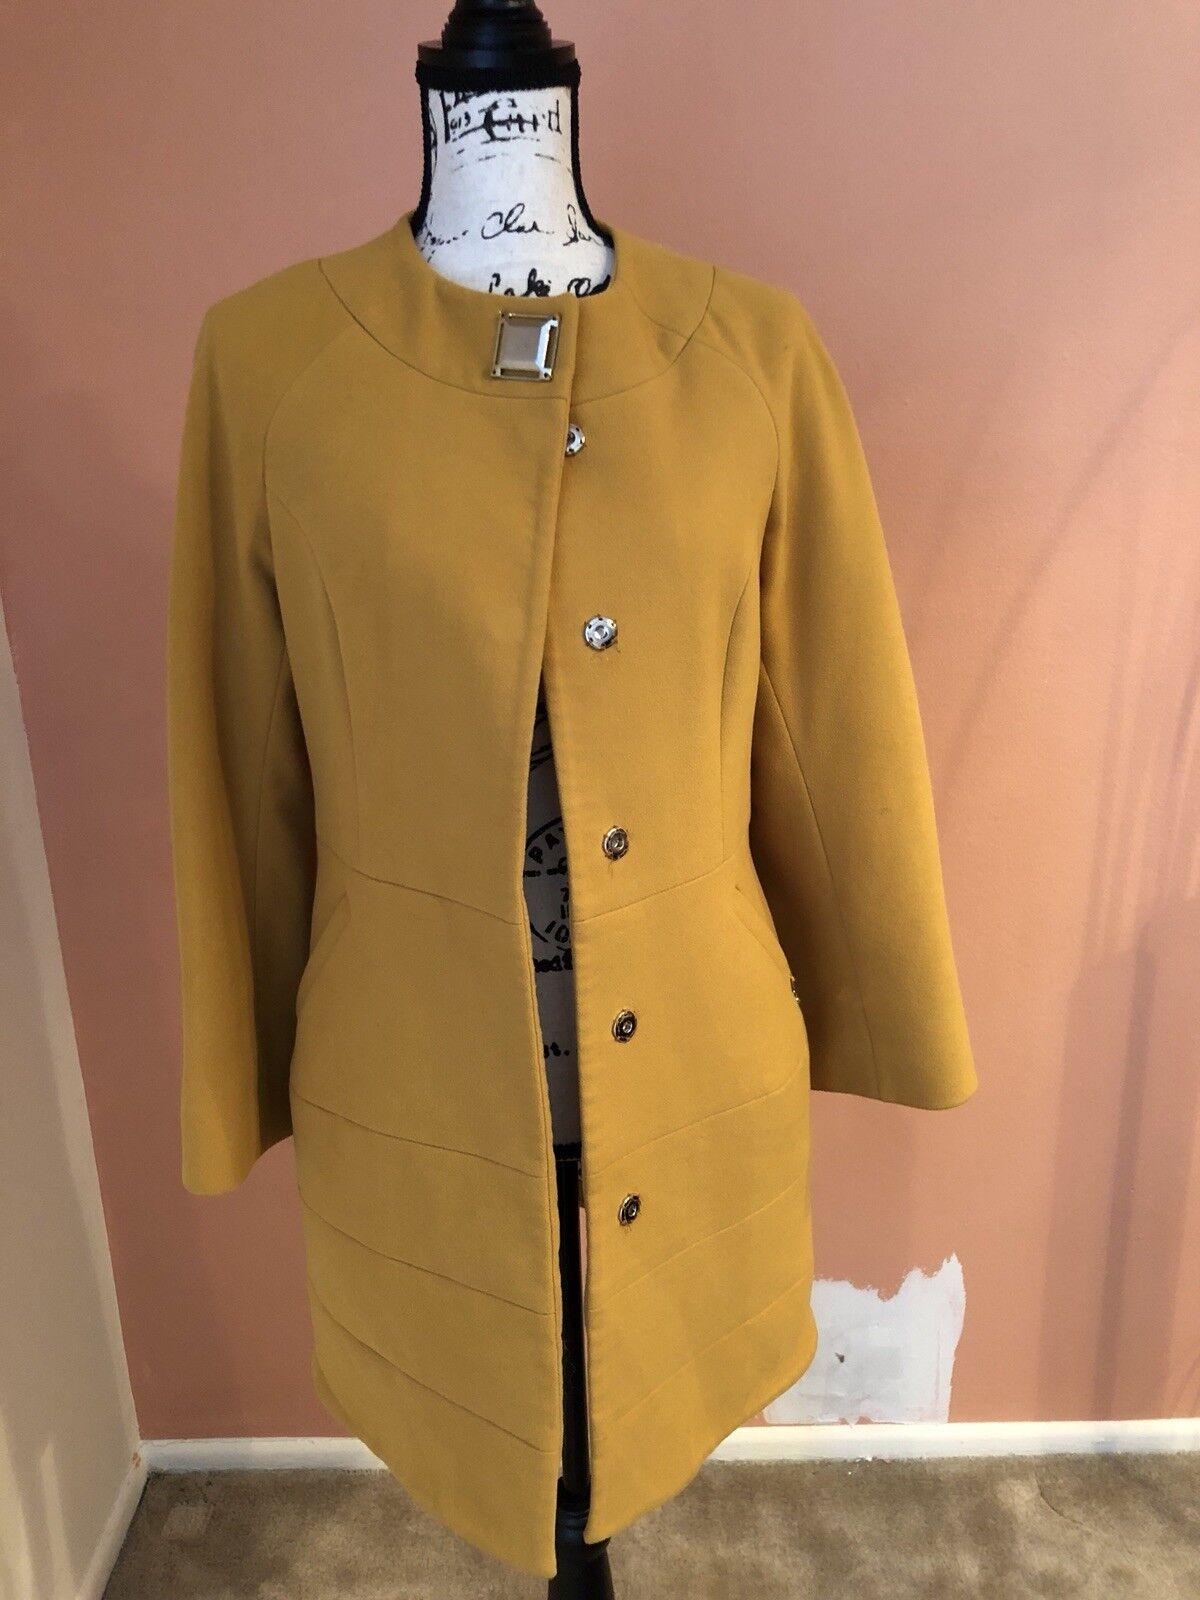 d19778513 Size Winter Coat Women's Small Yellow sleeve 4 3 lpkcf97061208-Coats ...